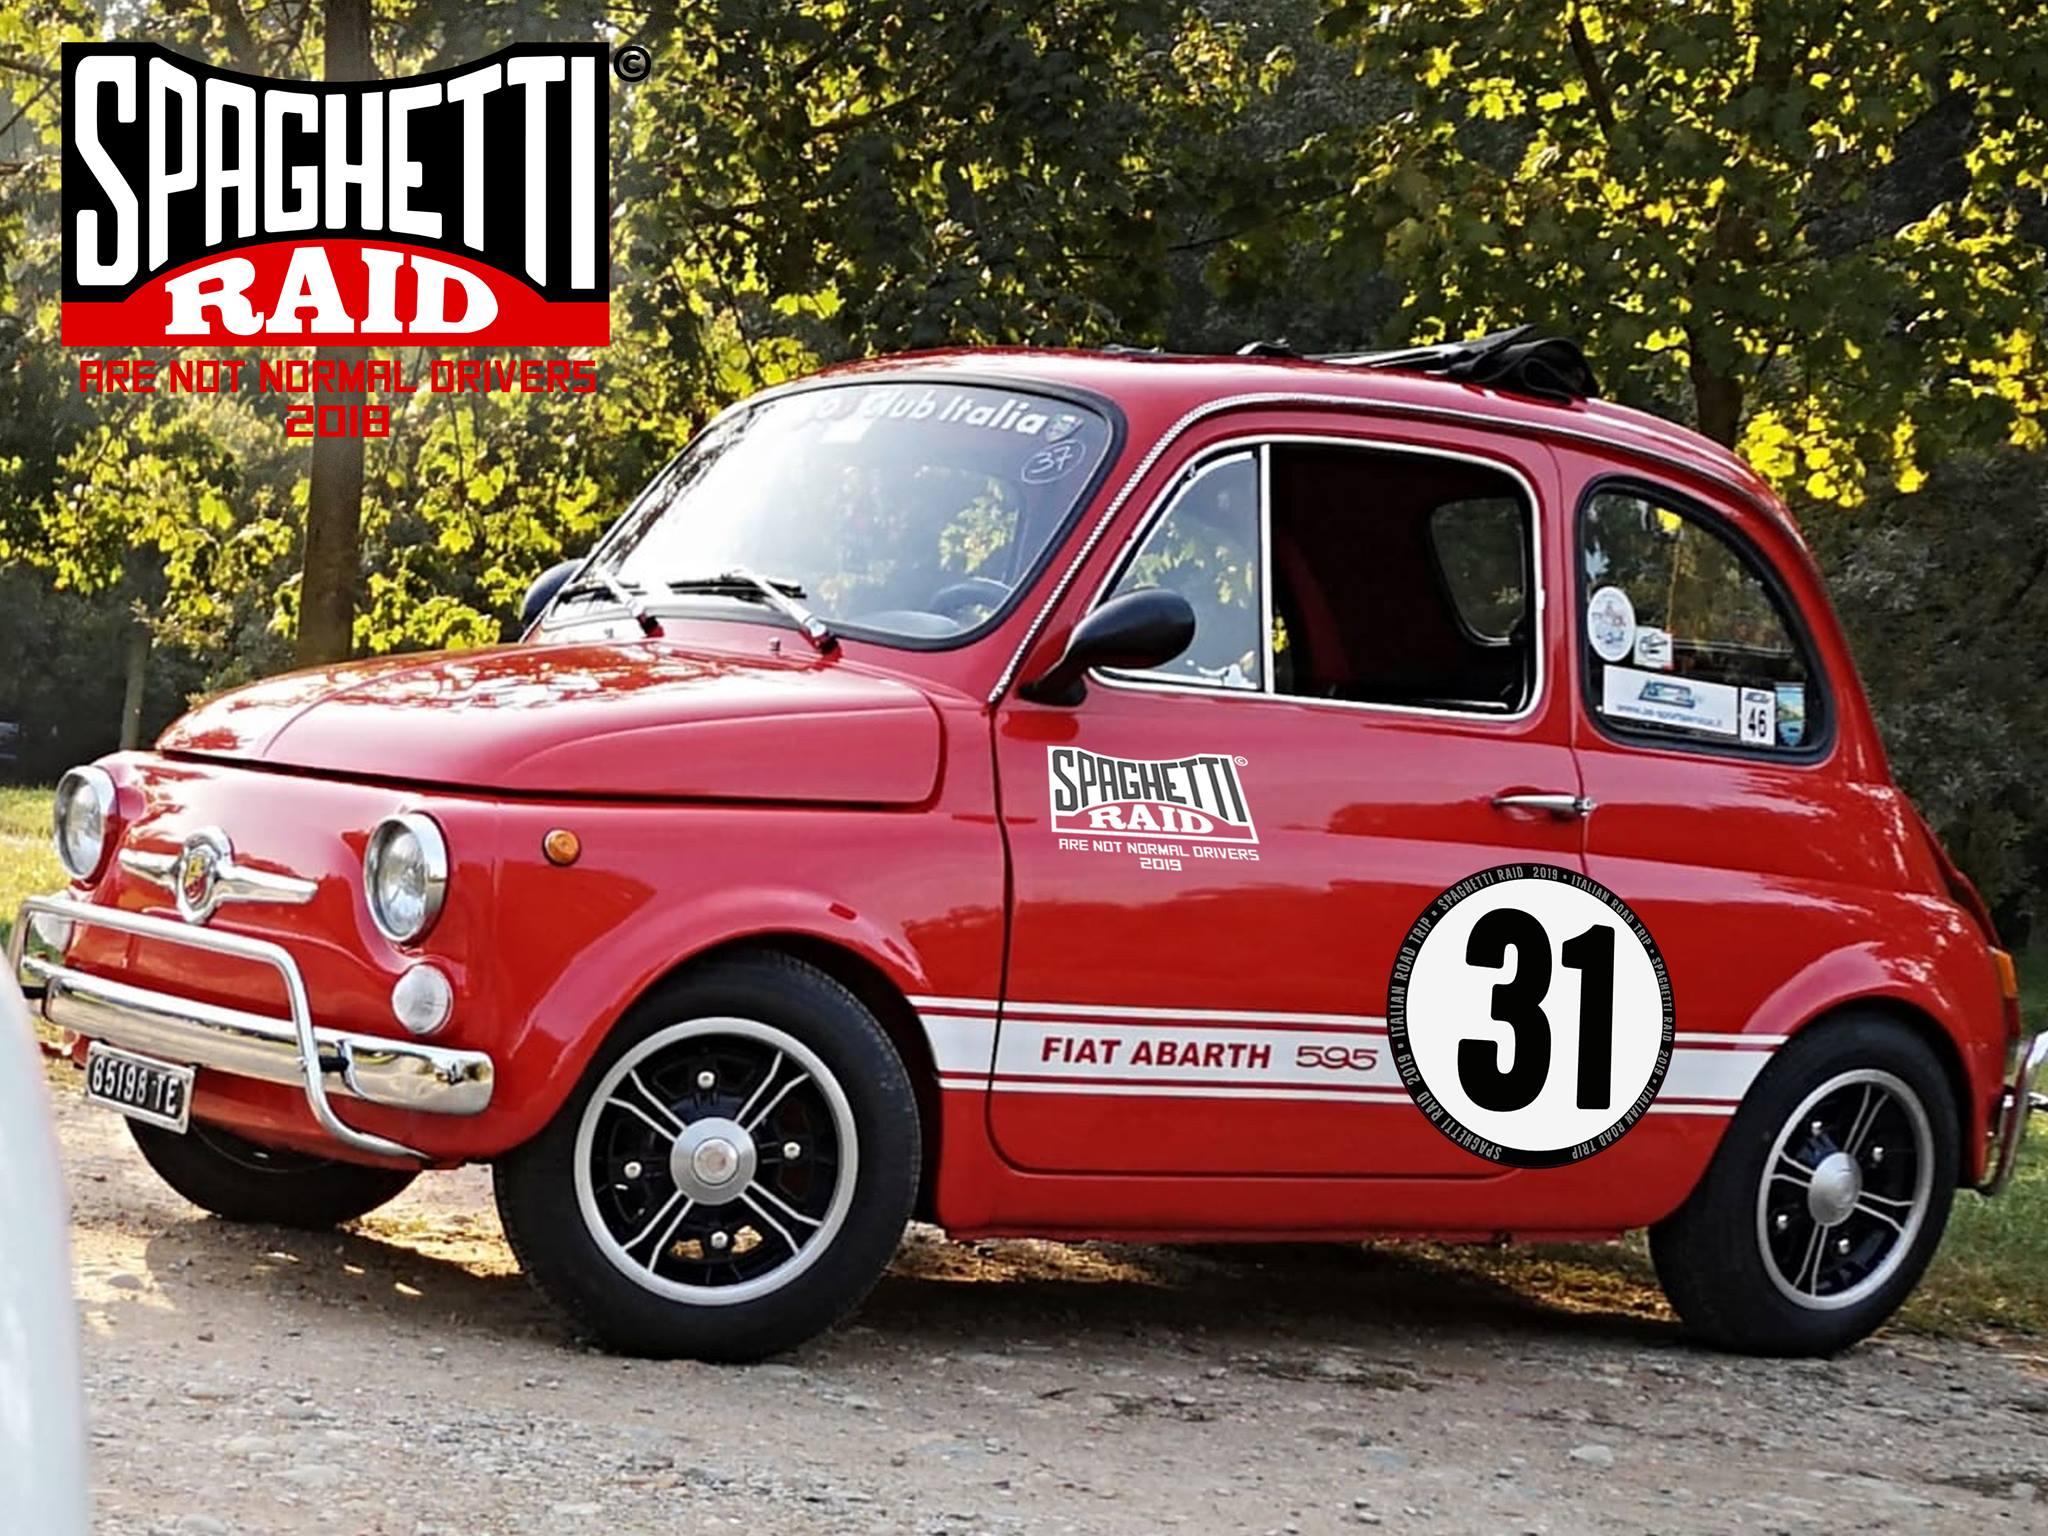 Team BANDA CICCIOTTI #31 FIAT 500L del'71 CIttà Castel Mella BS